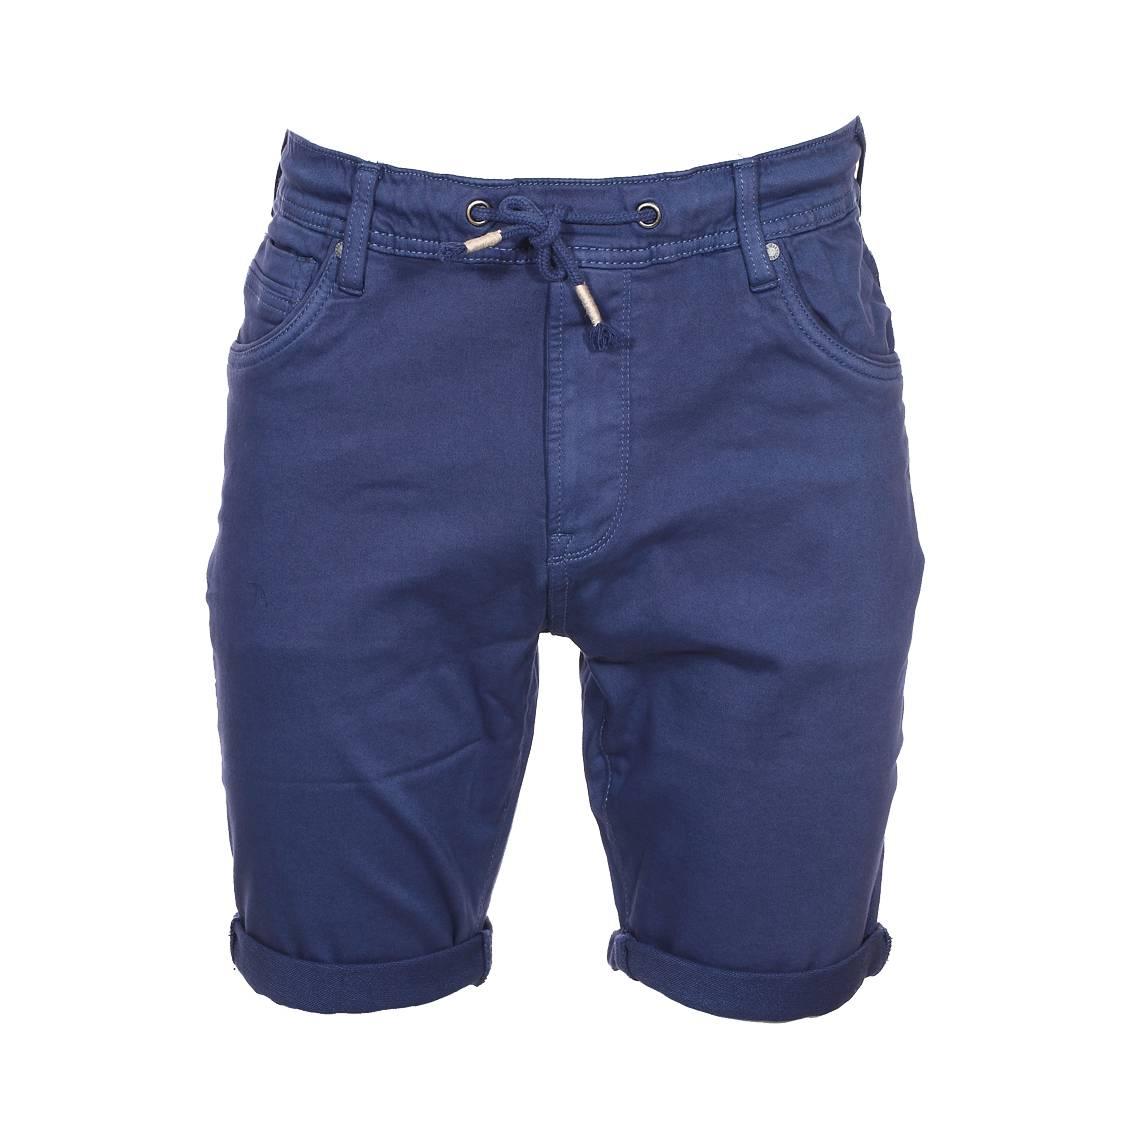 Short  jagger en coton stretch bleu marine